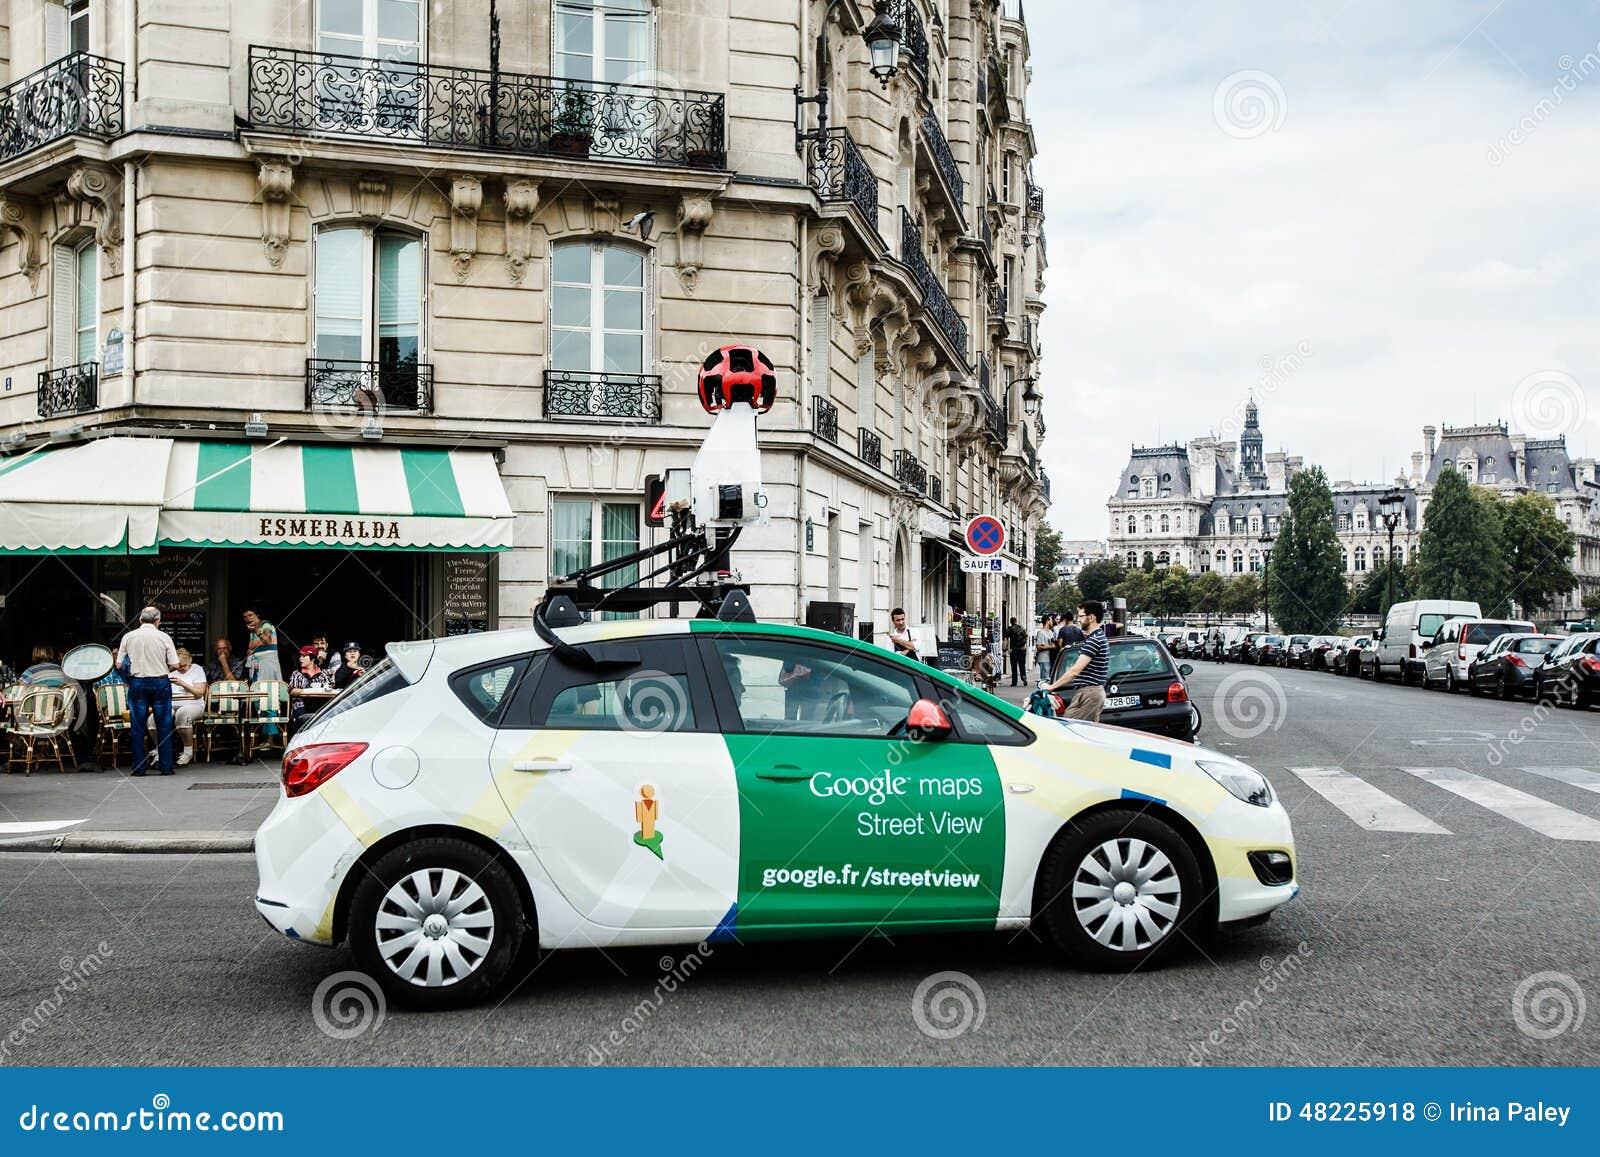 Apply To Drive Google Camera Car